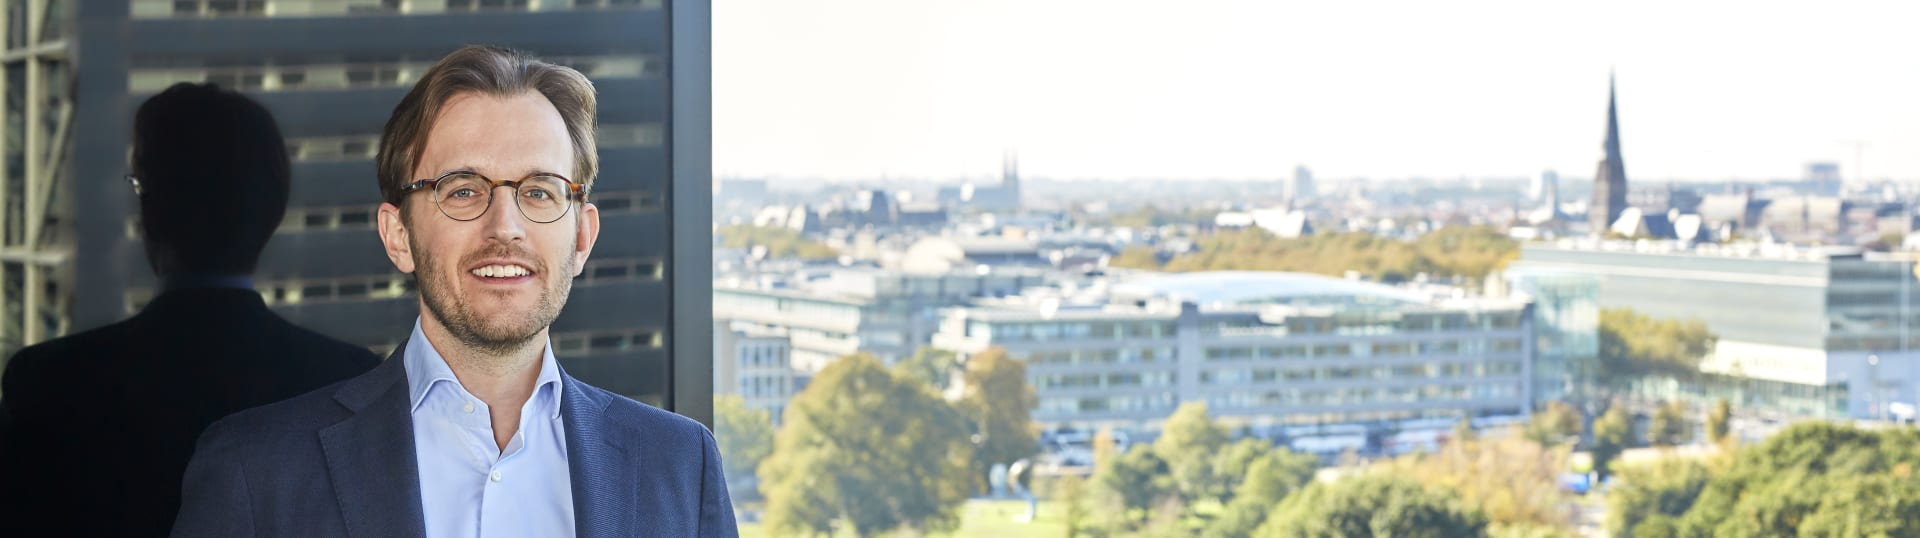 Jelmer Procee, advocaat Pels Rijcken